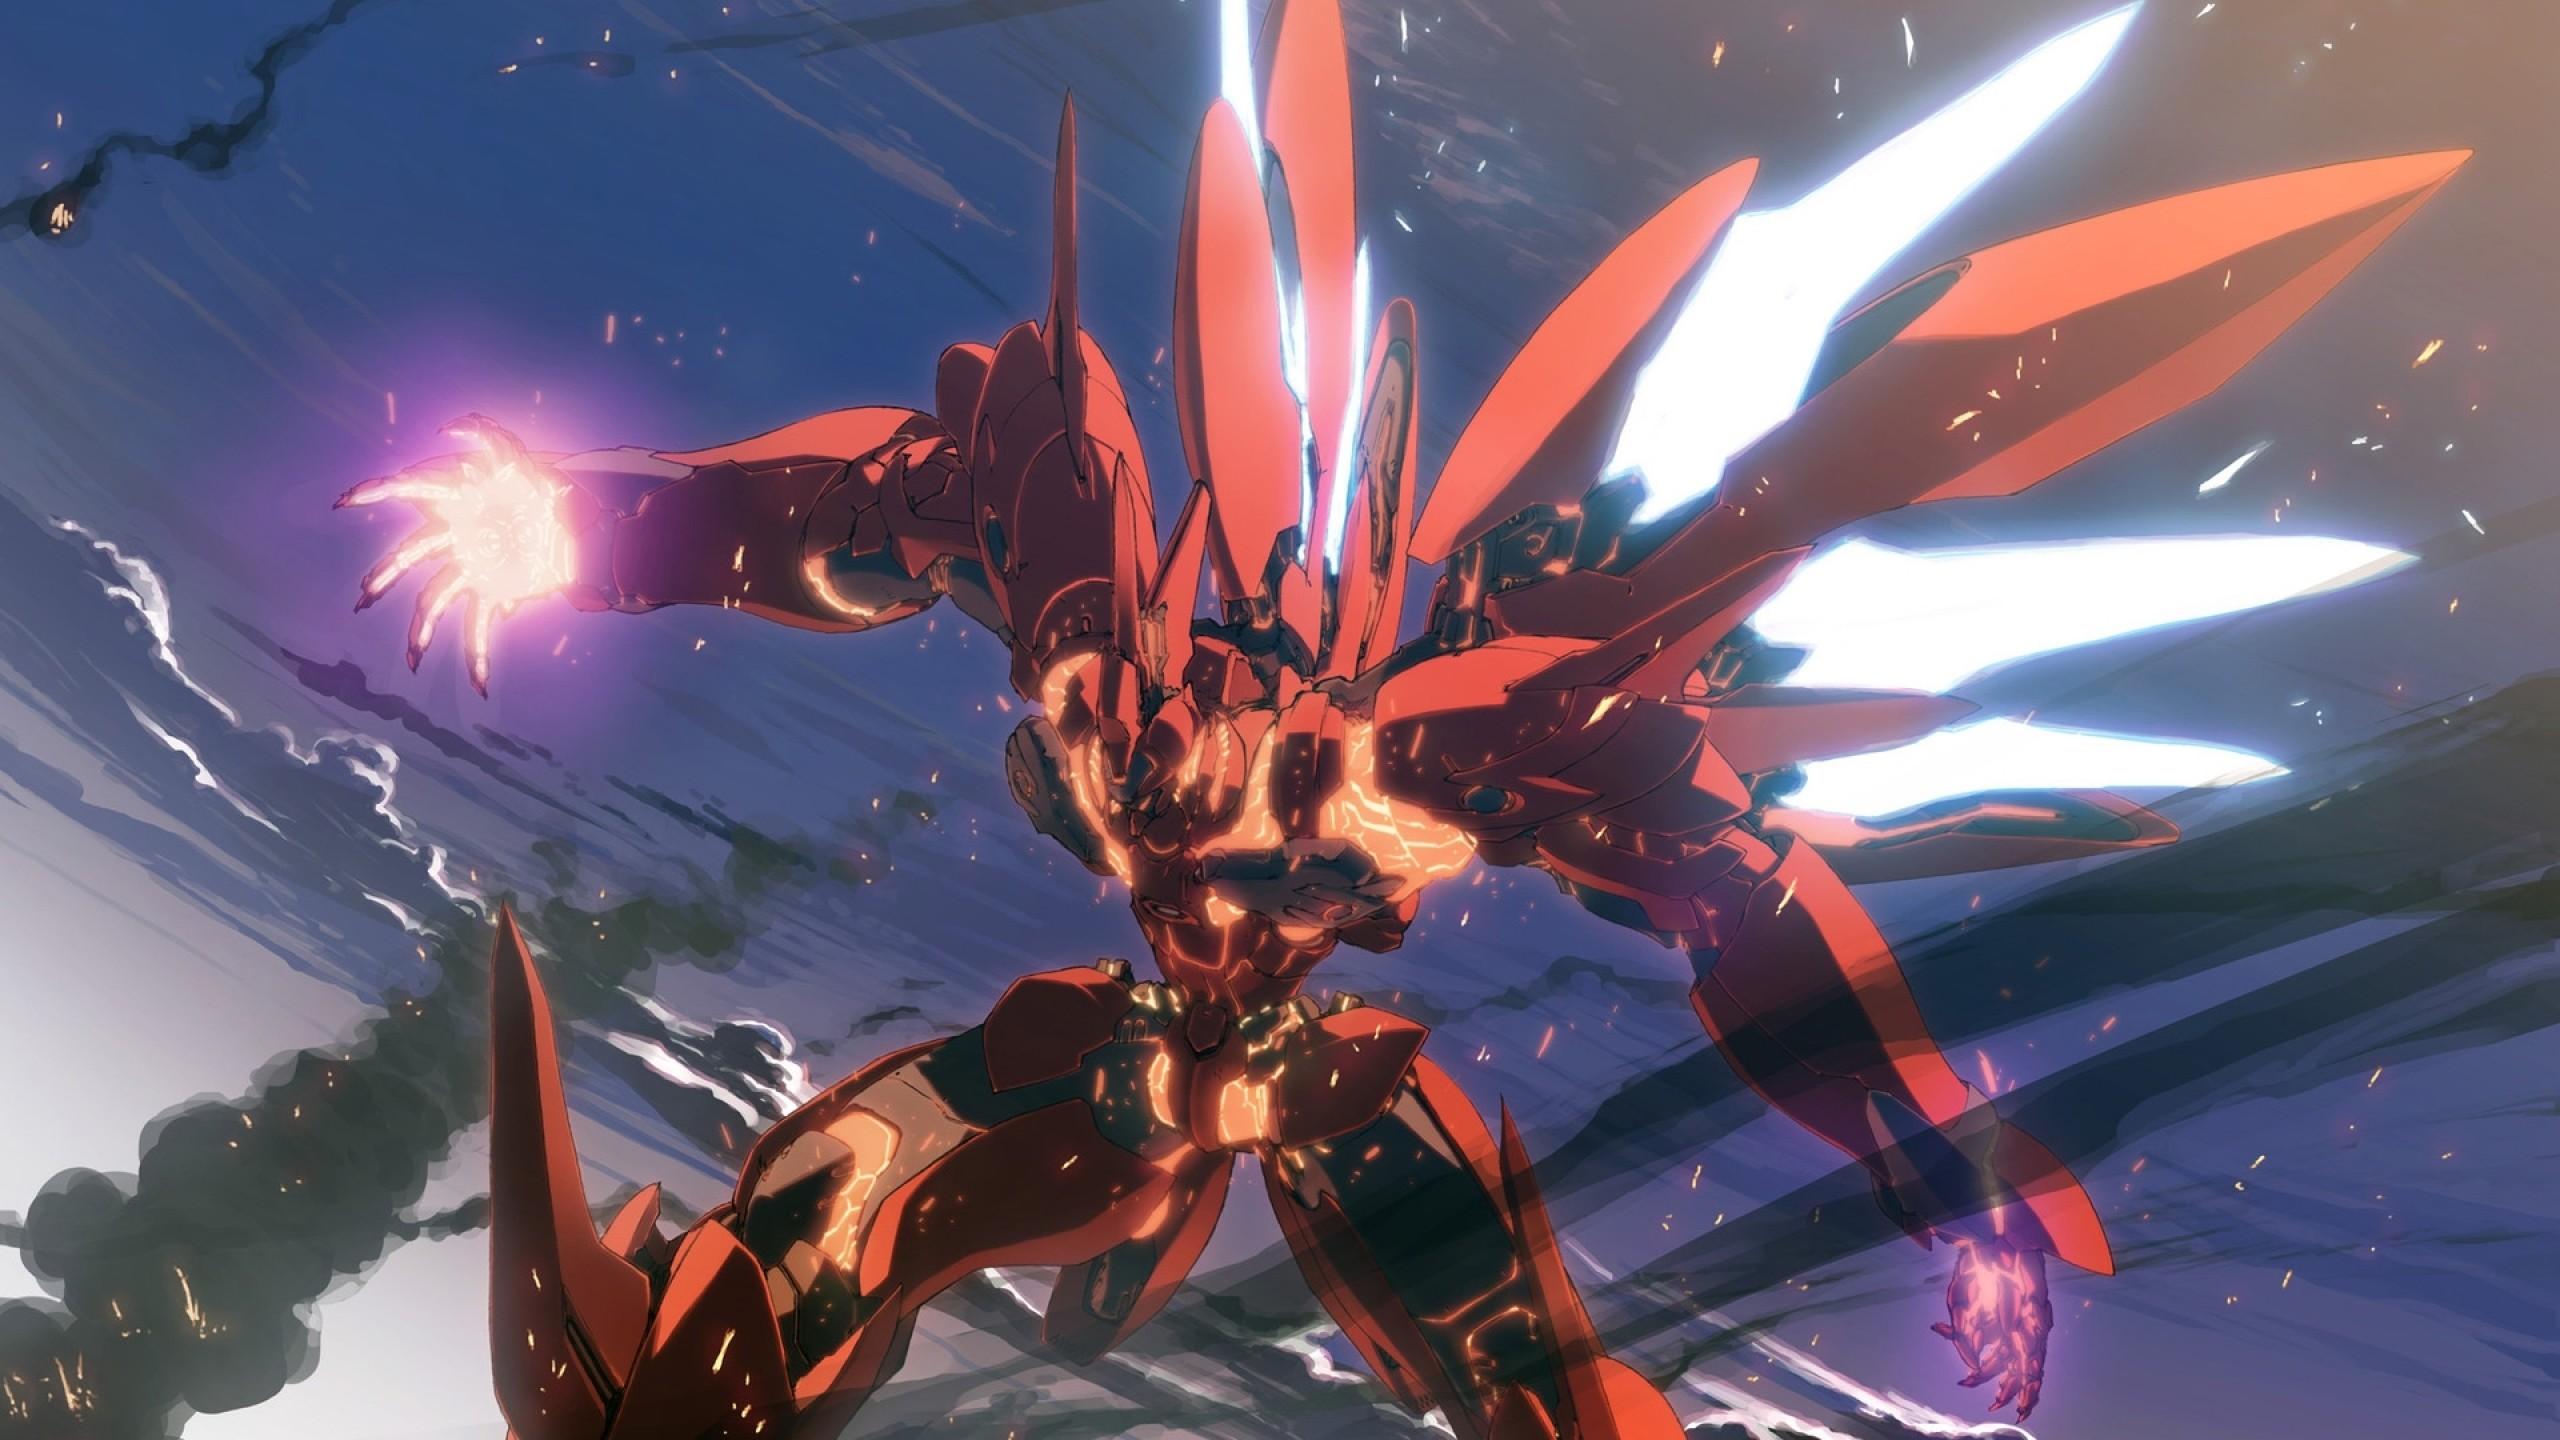 wings robots mecha anime 1920×1080 wallpaper Art HD Wallpaper